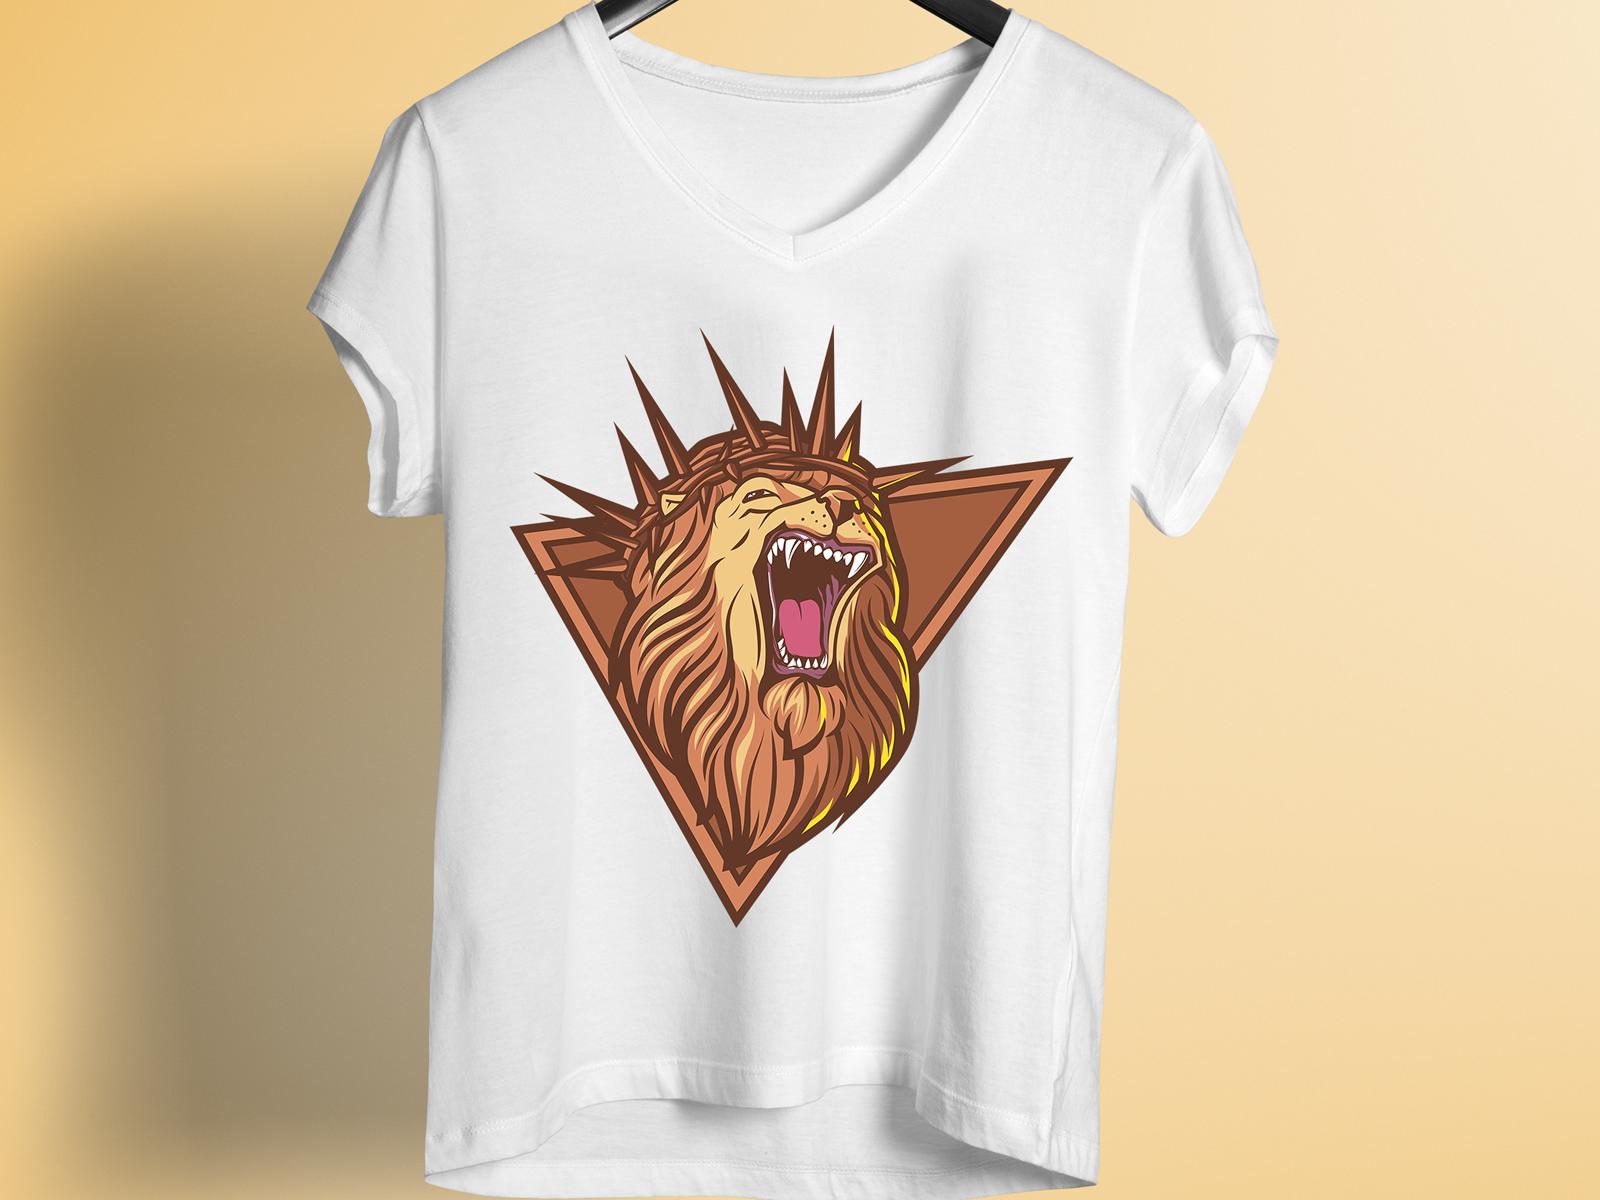 Lion T Shirt Design By Teestation Dribbble Dribbble